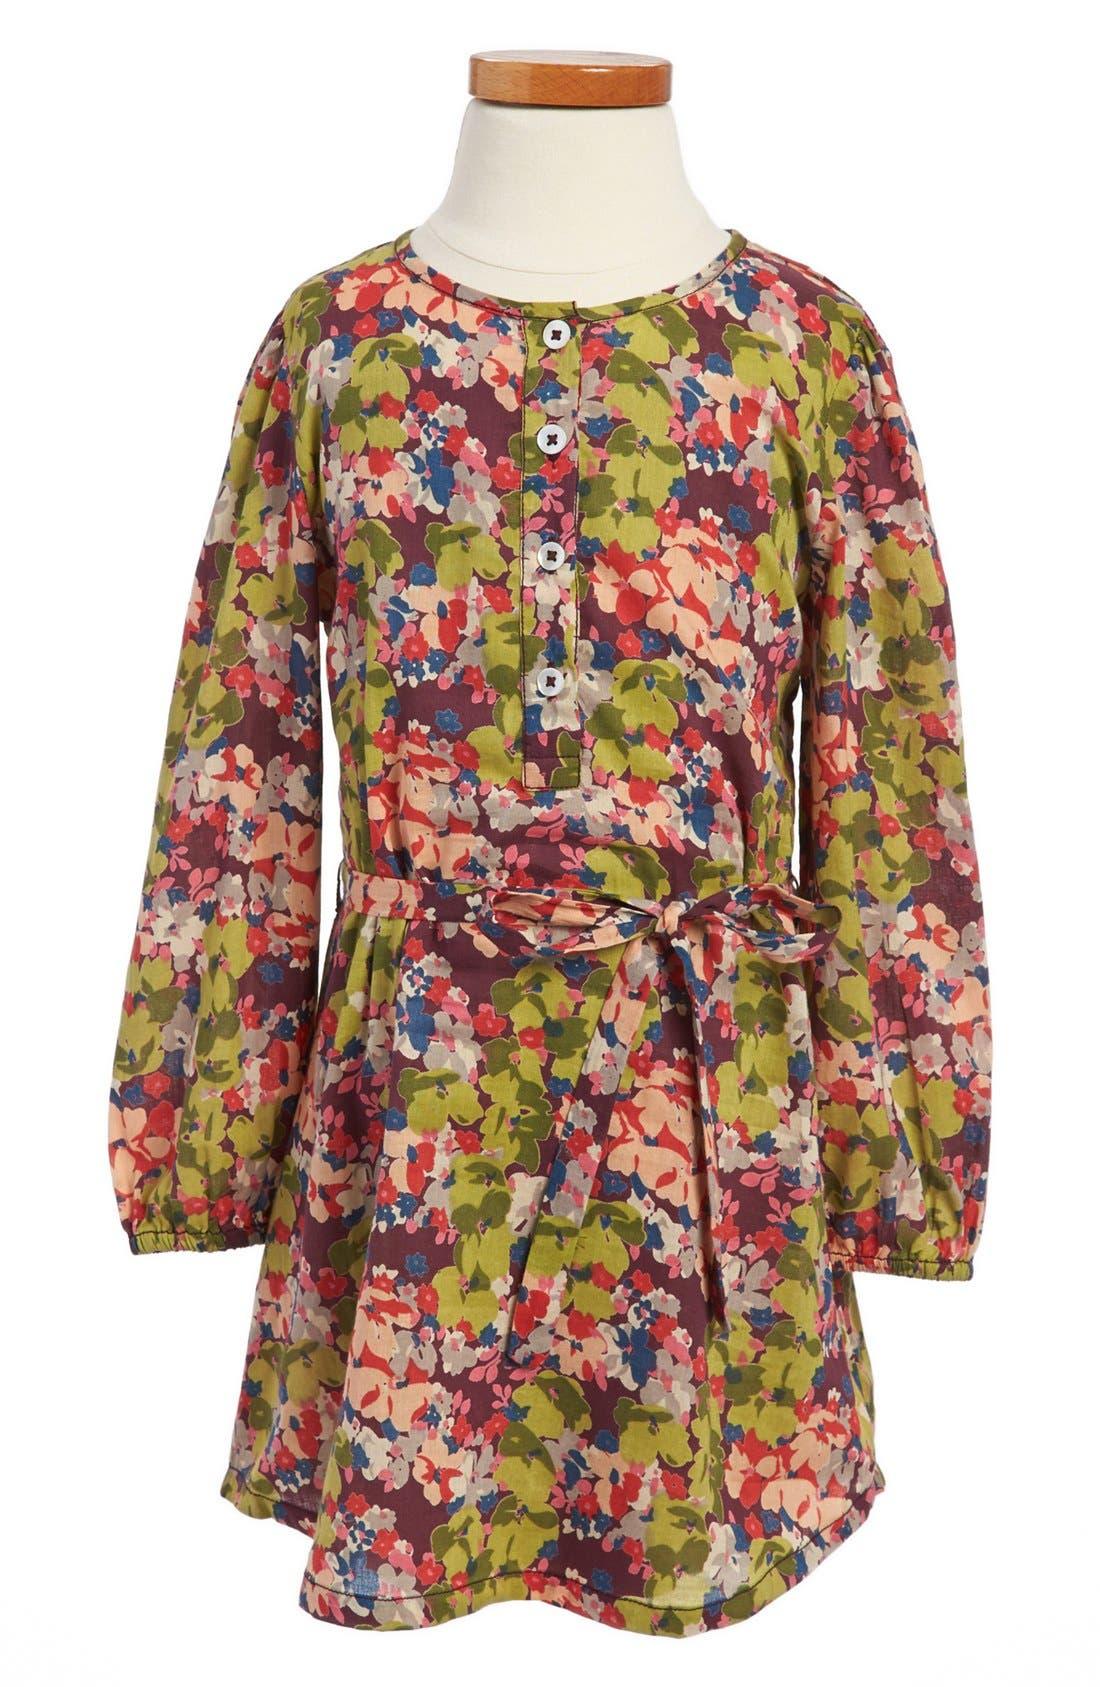 Alternate Image 1 Selected - Peek 'Miller' Dress (Toddler Girls, Little Girls & Big Girls)